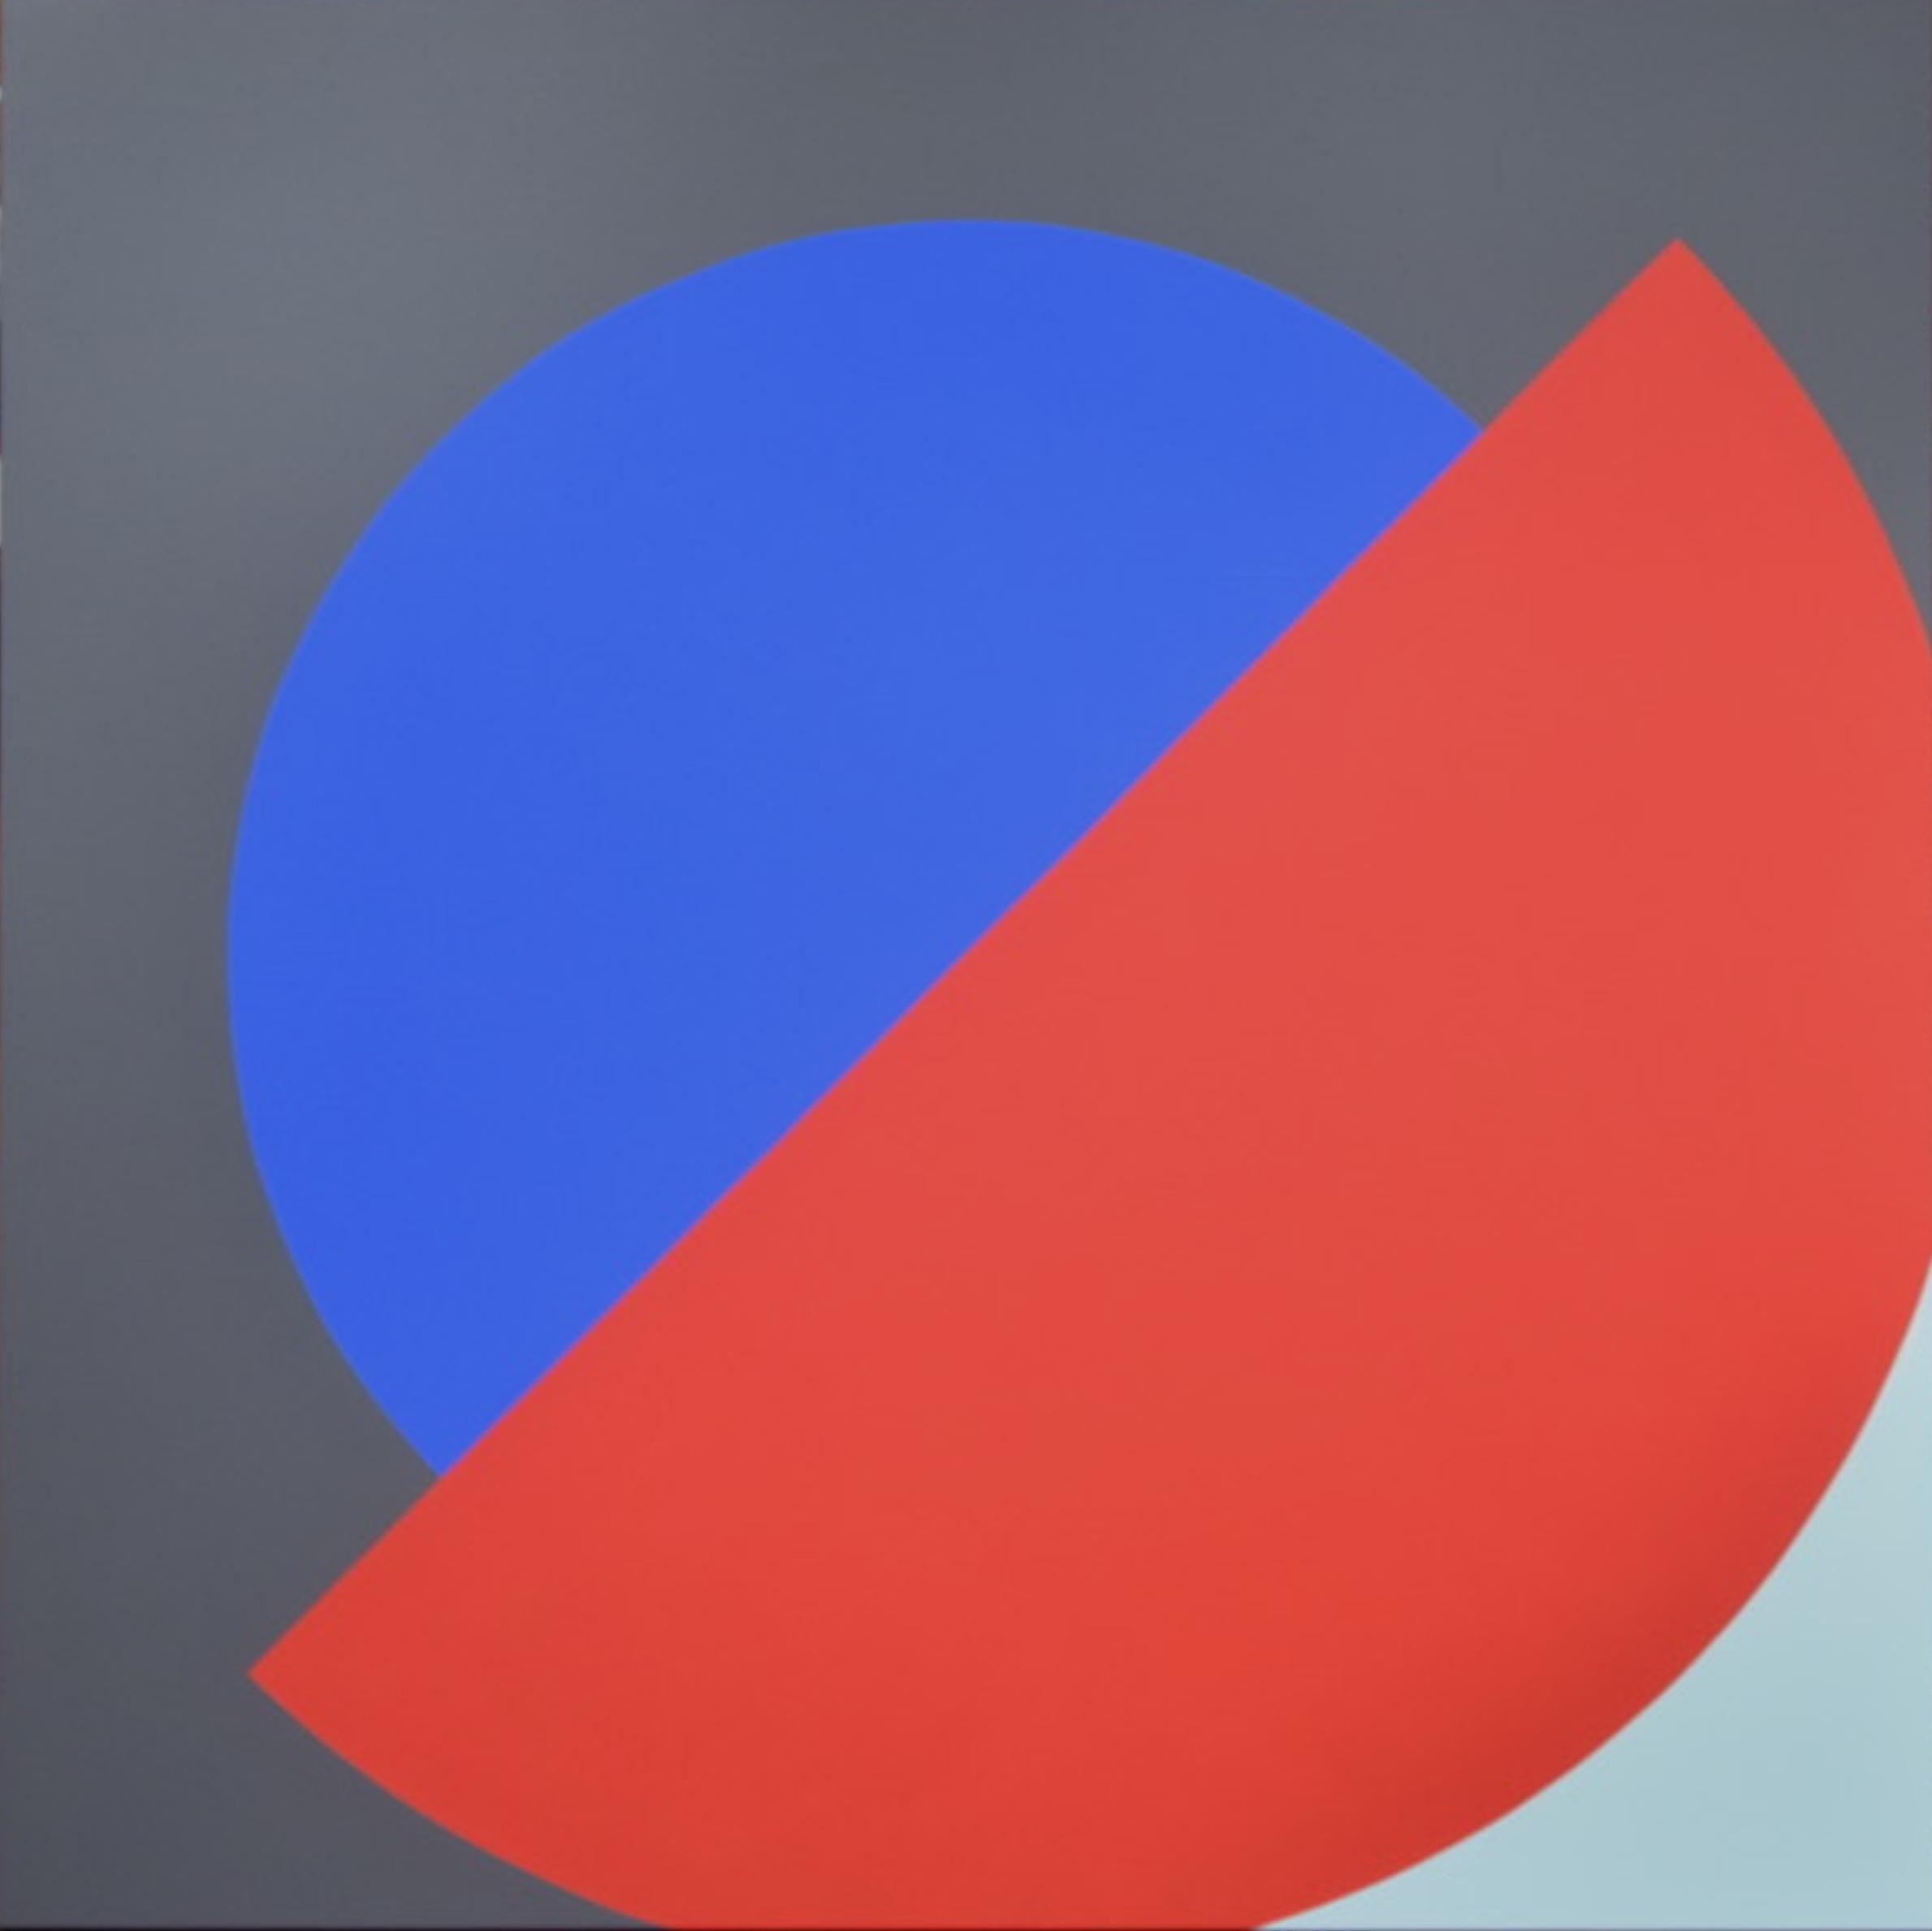 Untitled 3. 2018. Acrylic on canvas. 137 x 137 cm $3,700